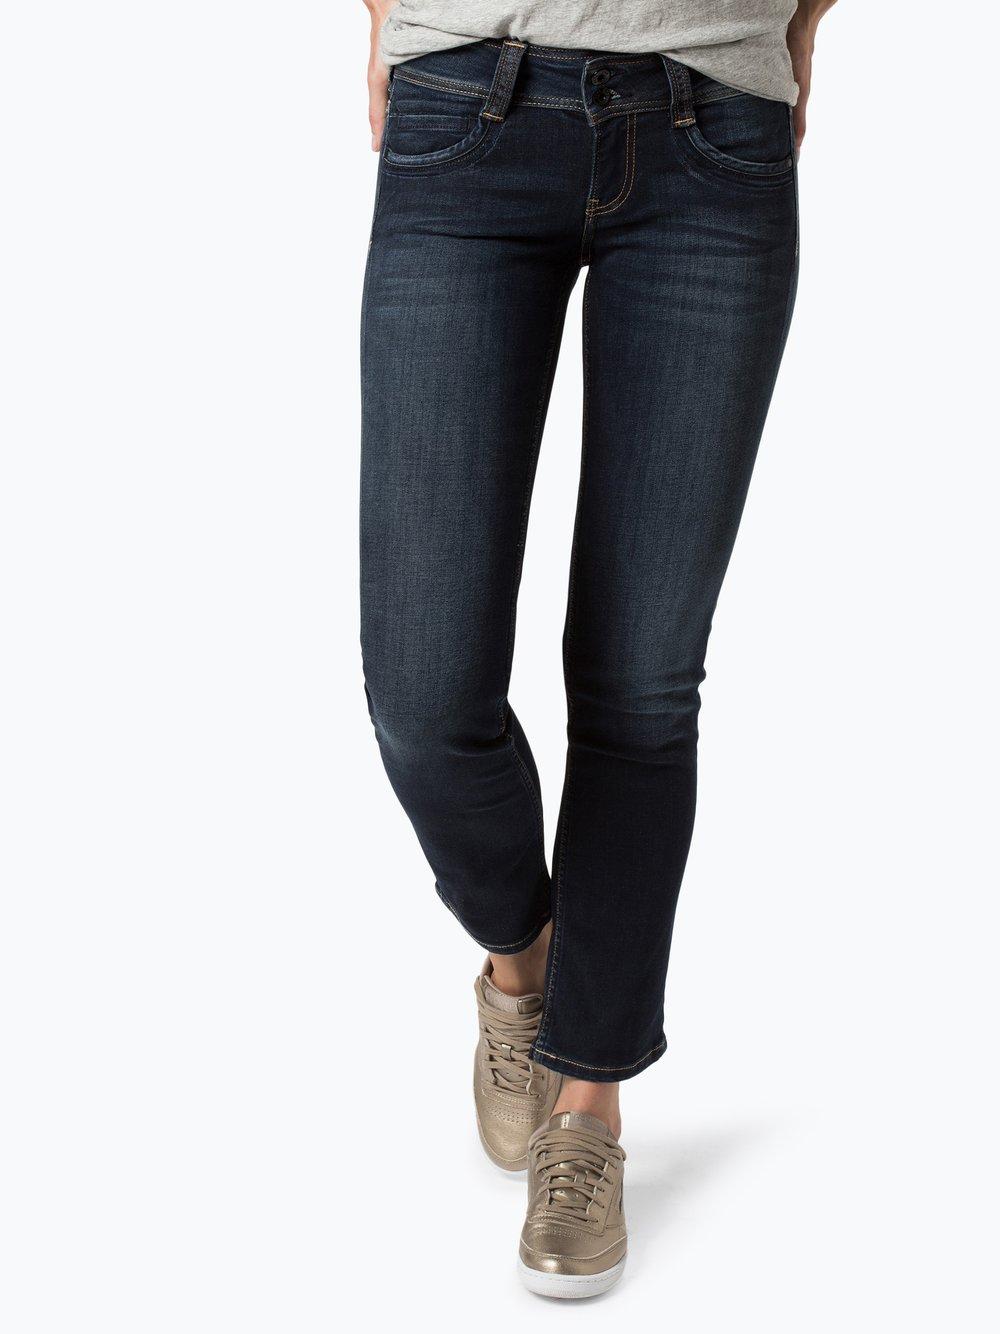 Pepe Jeans  GEN Damenjeans